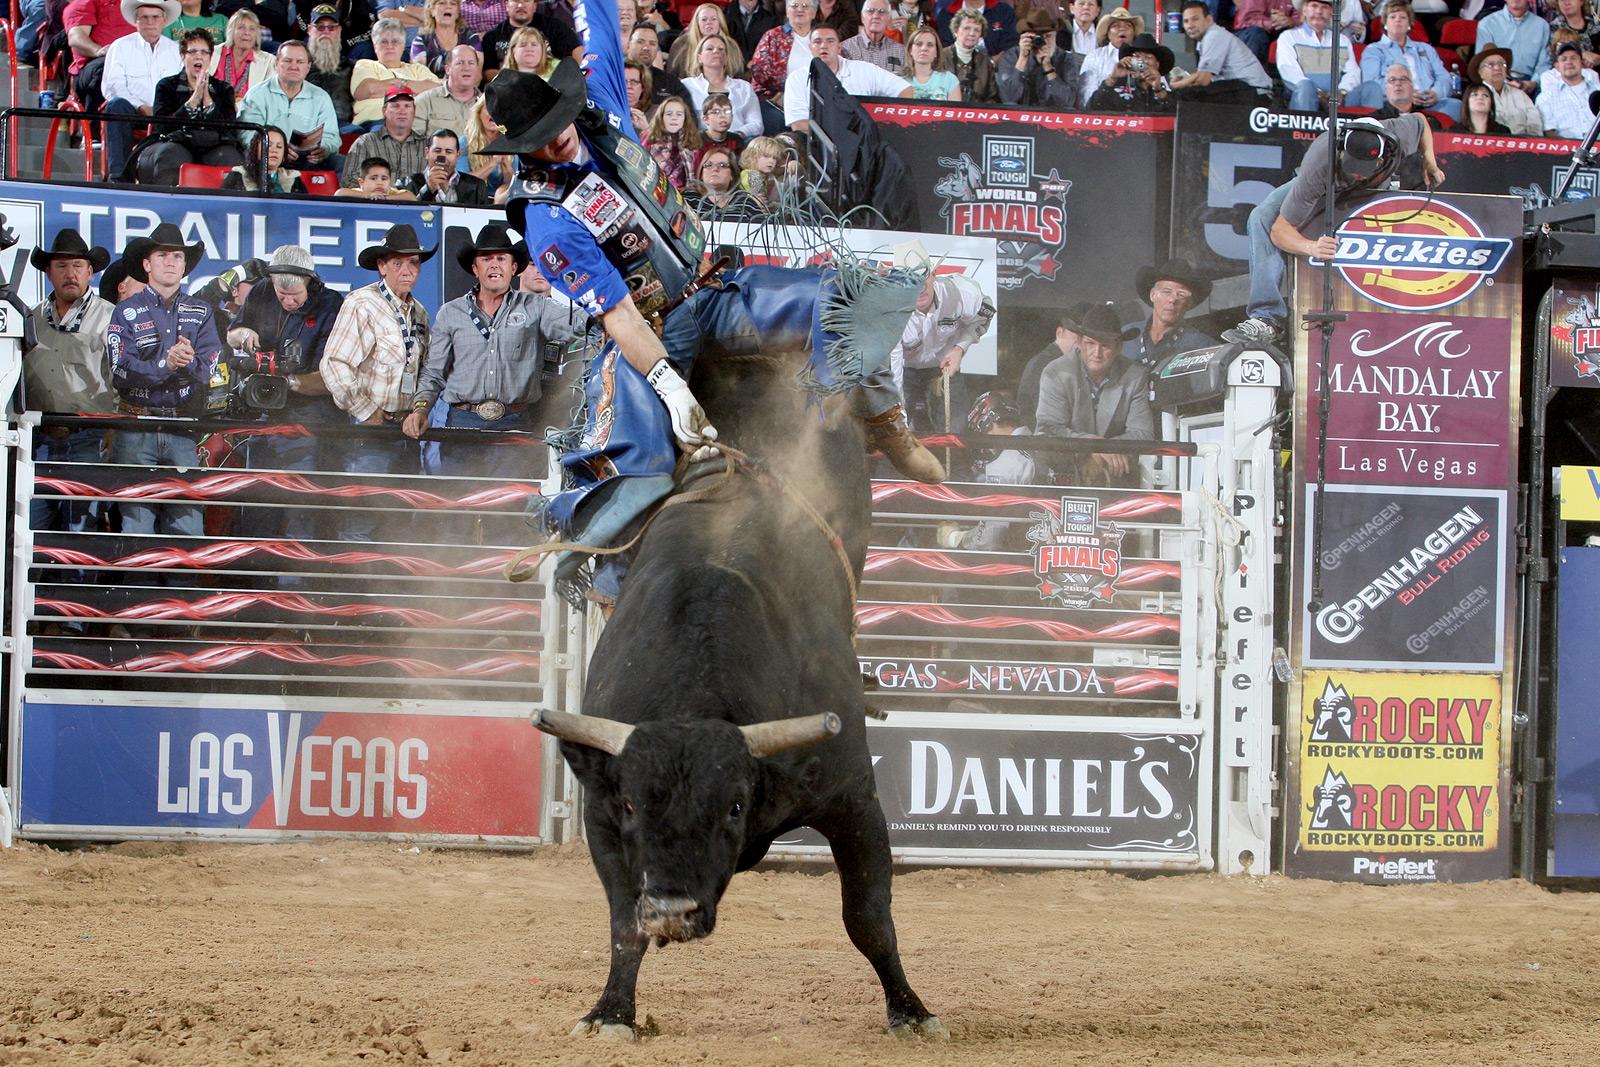 61 bull riding wallpapers on wallpapersafari - Bull riding wallpapers ...